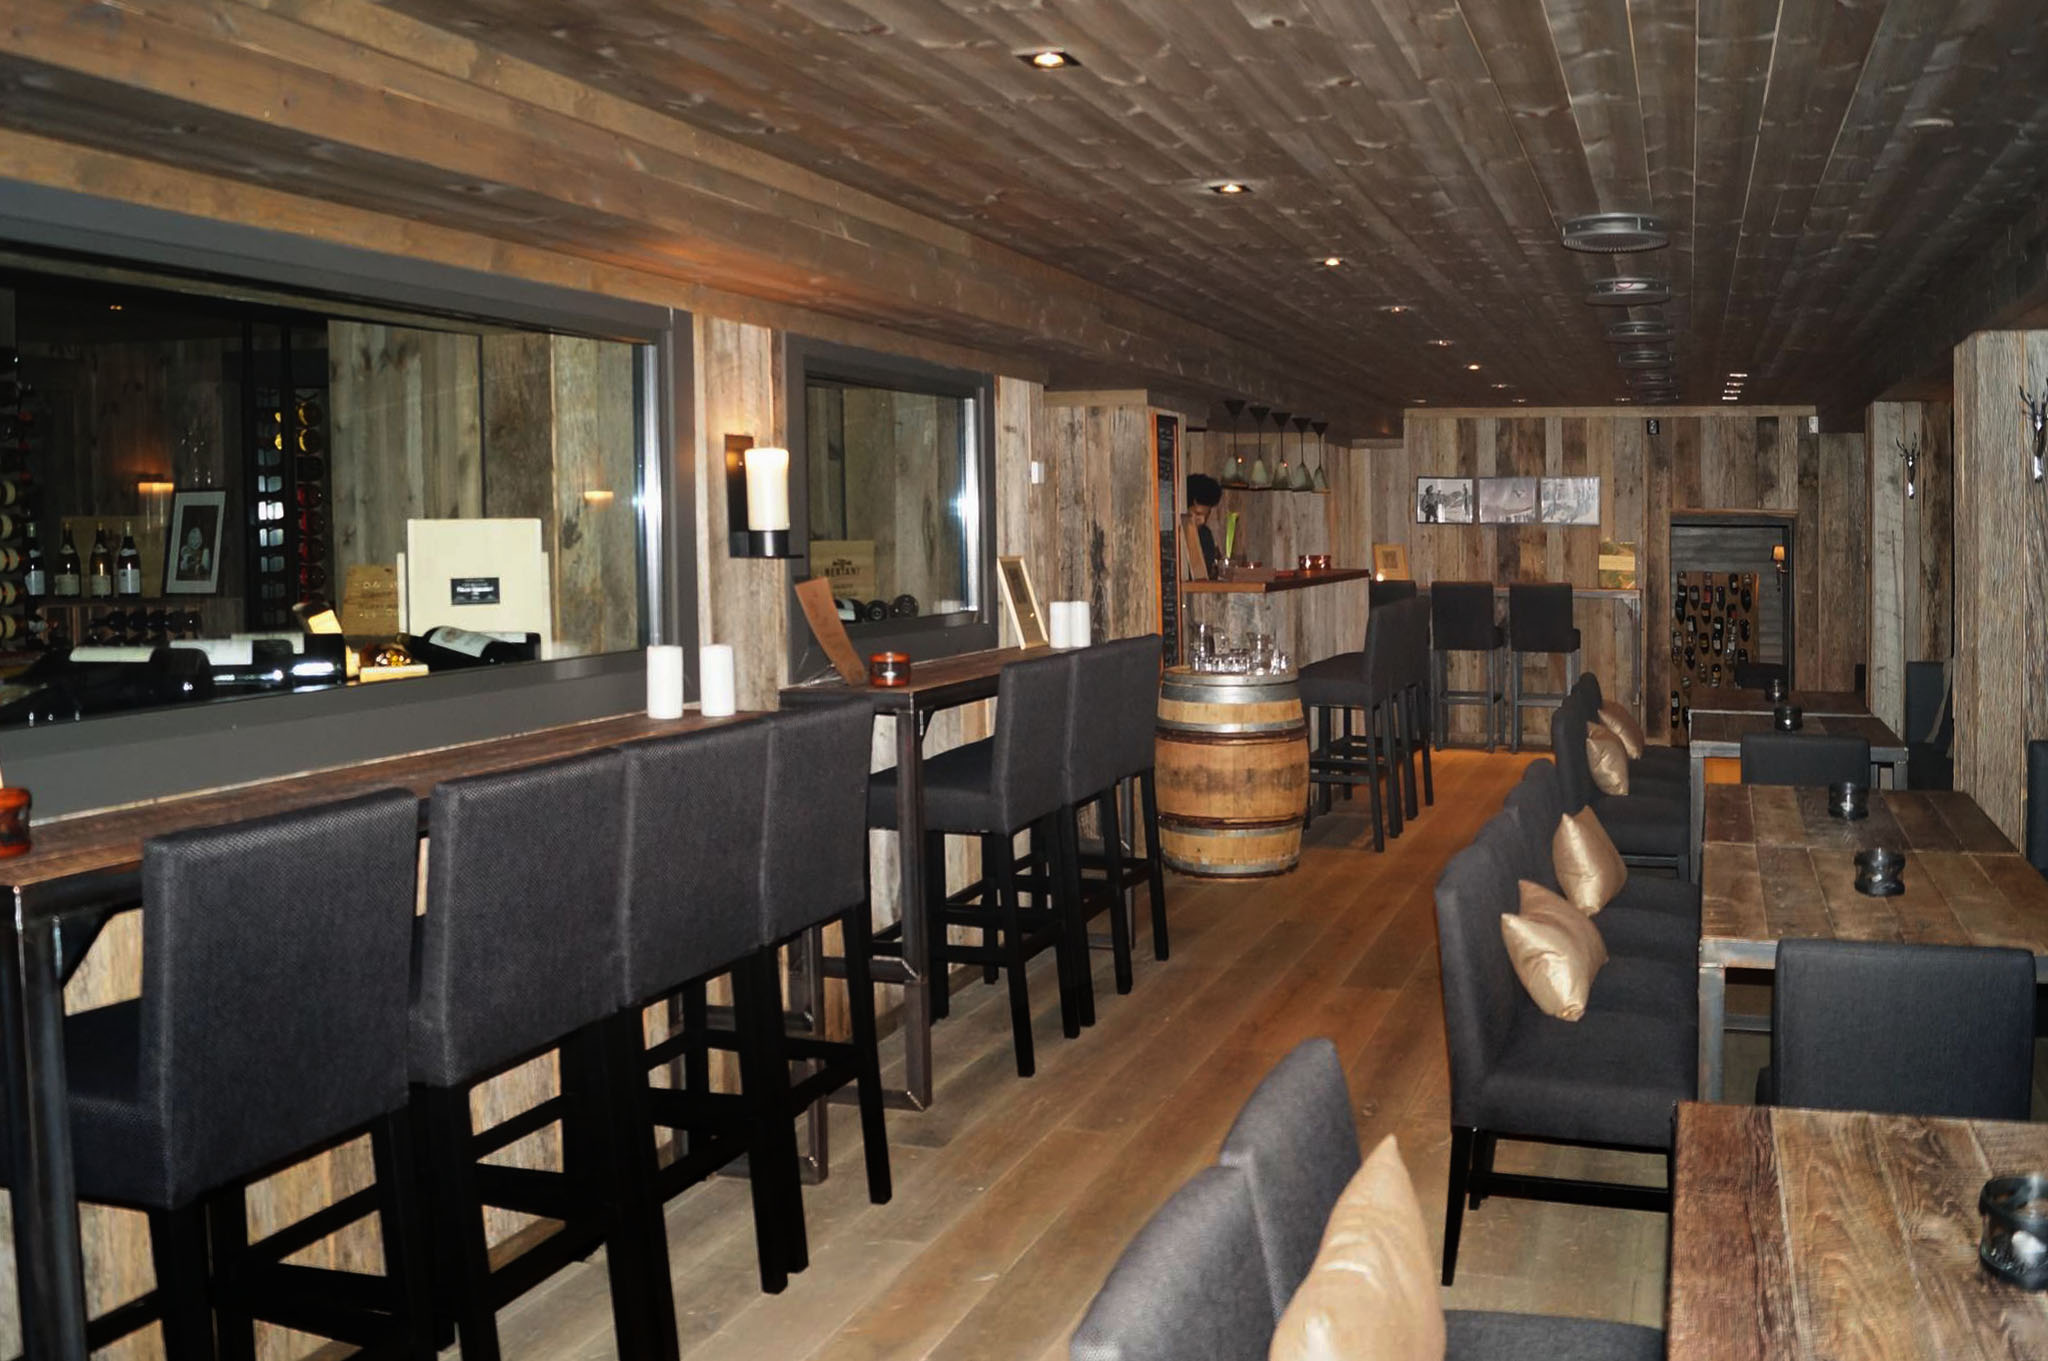 Reclaimed Barn Wood – Hallingstuen Geilo, Norway